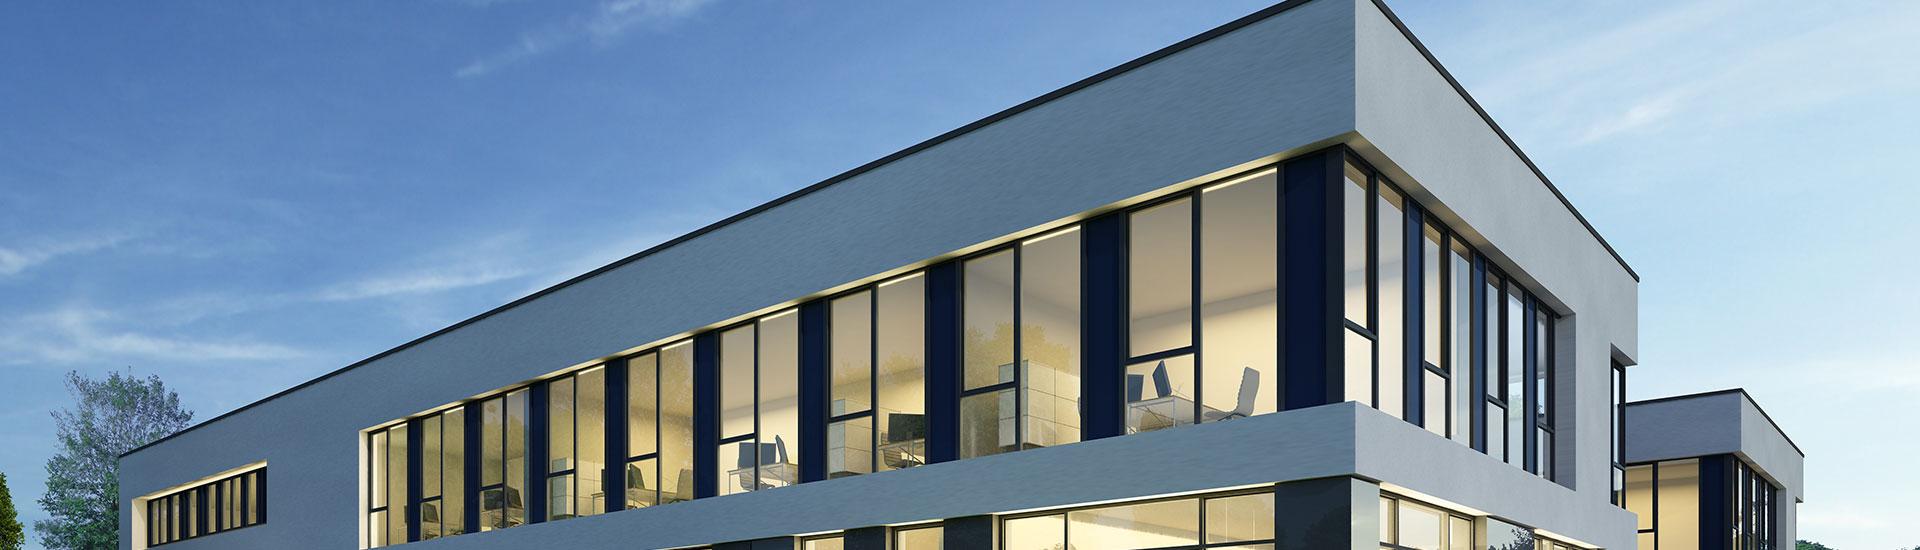 Architekturbüro Matthias Bauer